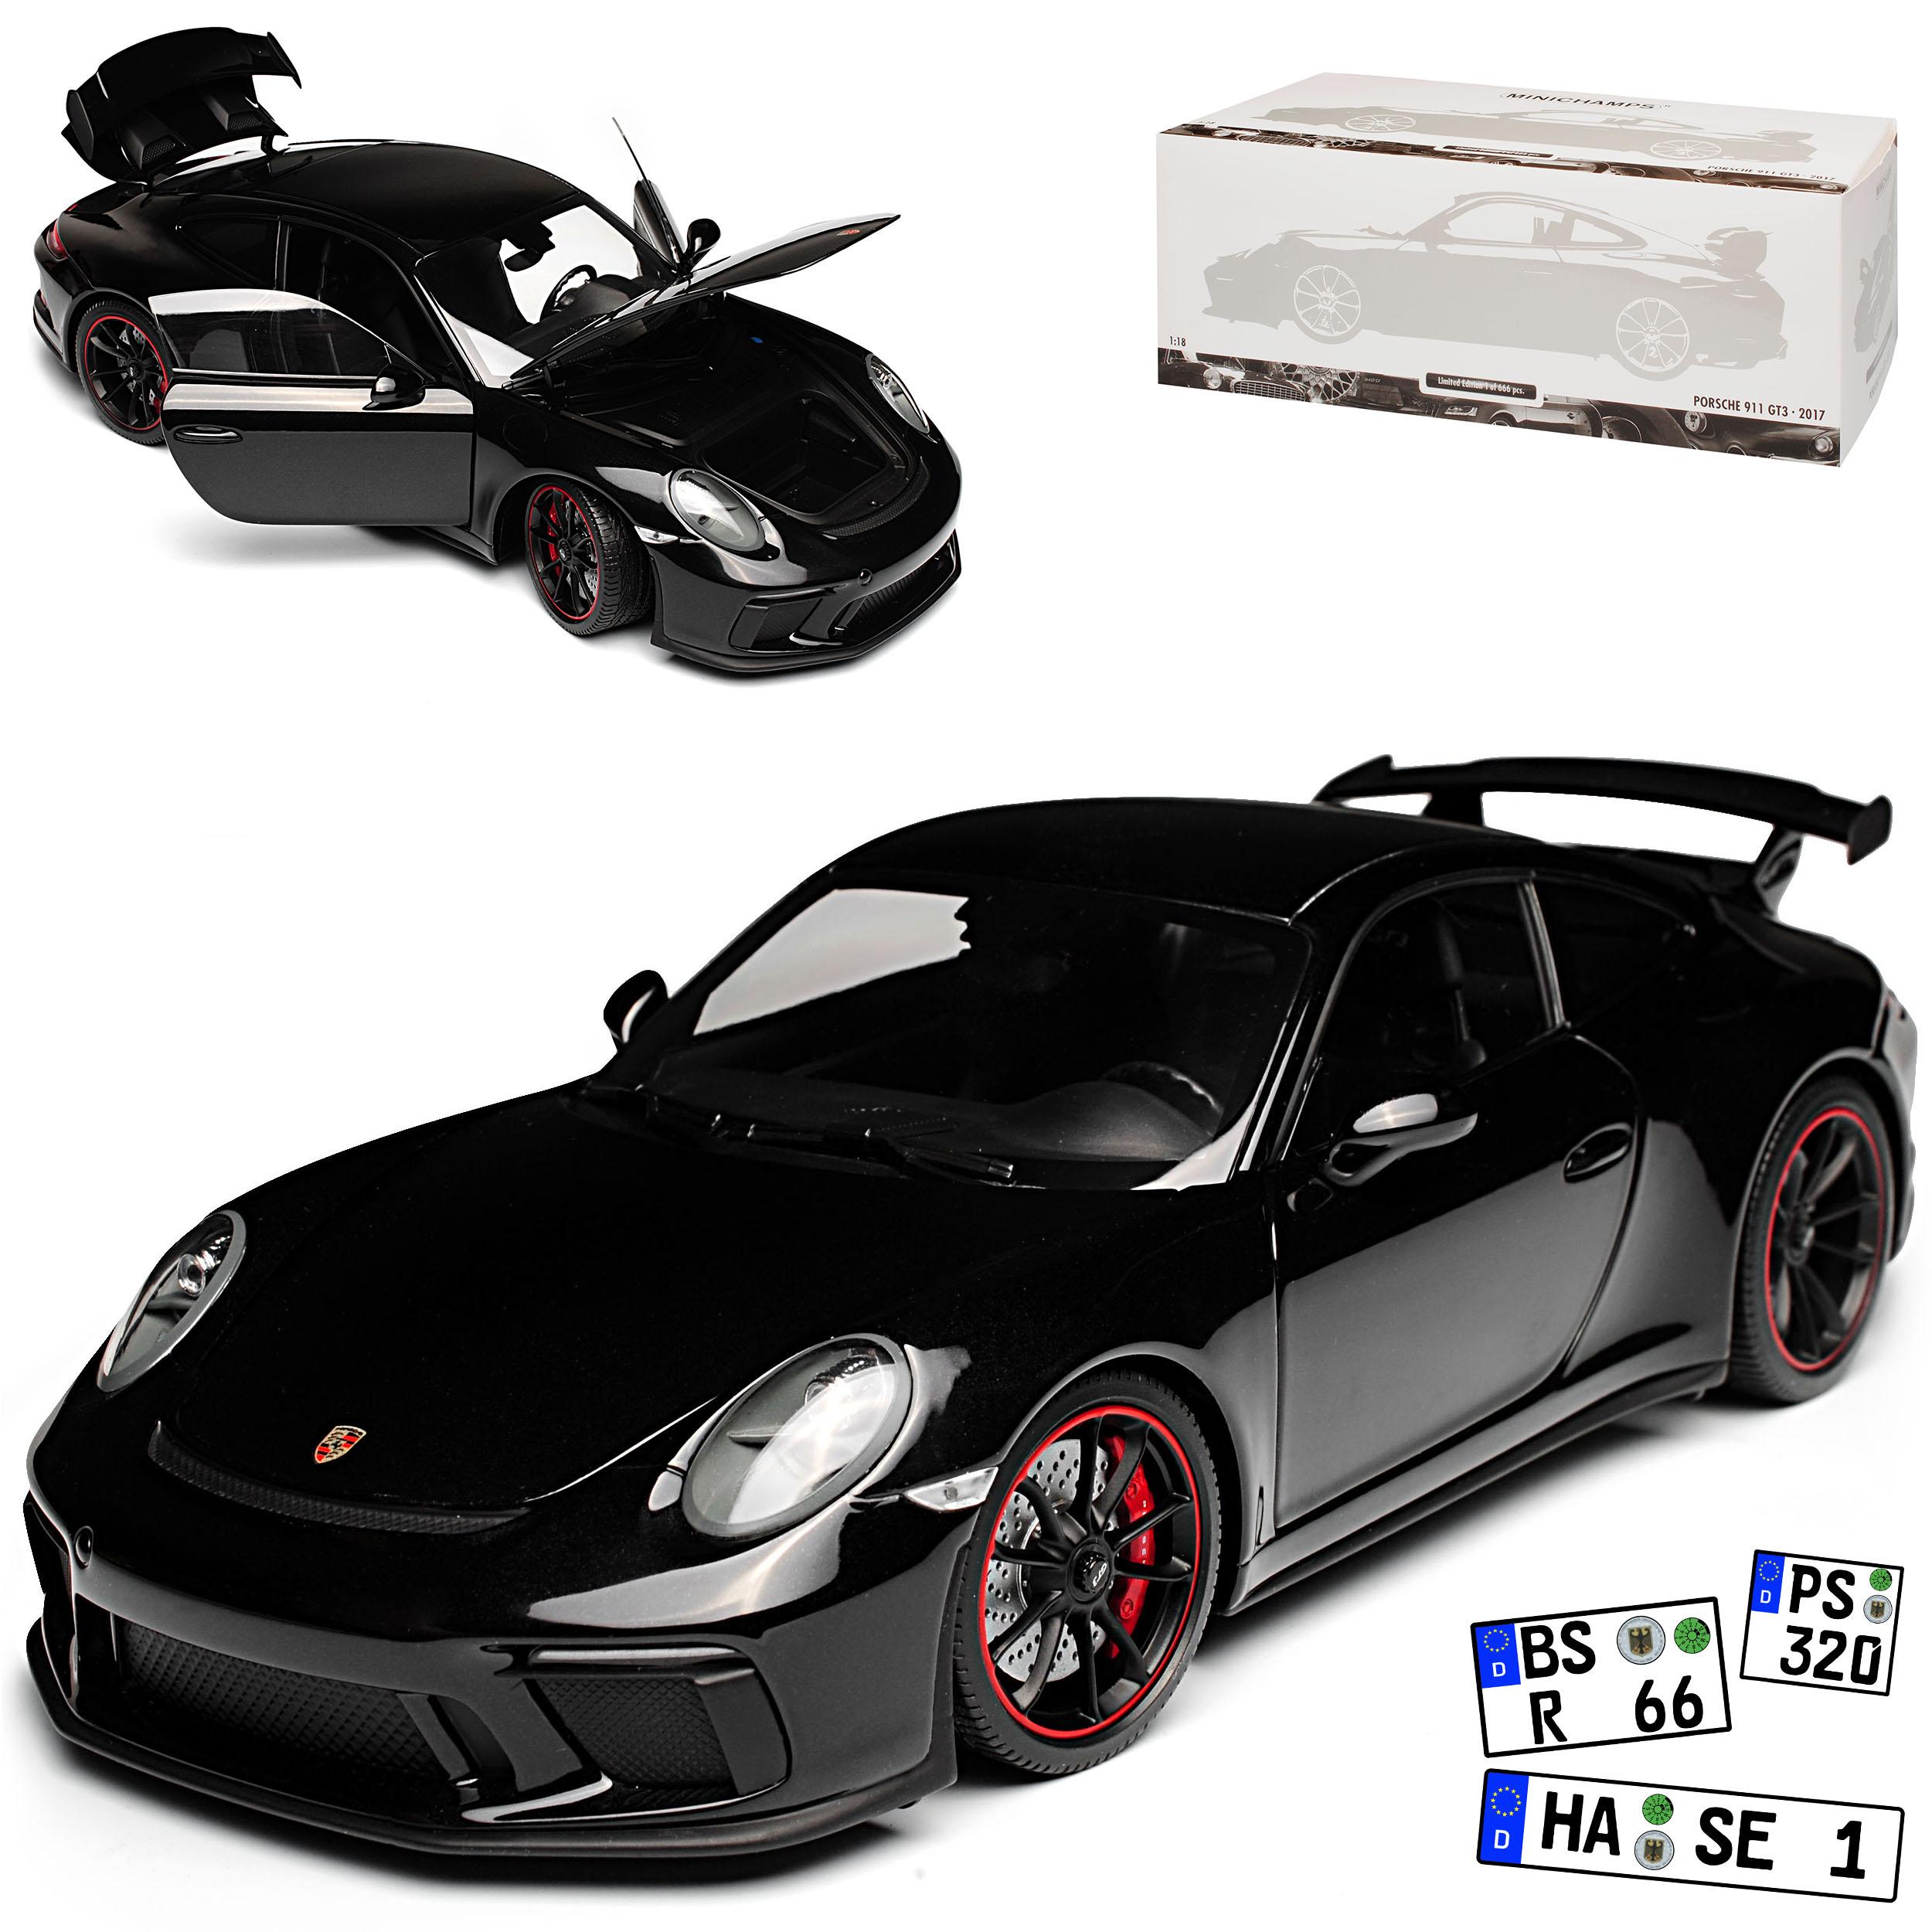 la red entera más baja Porsche 911 991 991 991 gt3 coupé negro metálico modelo 2013-2019 versión a partir de 2017 Li...  costo real